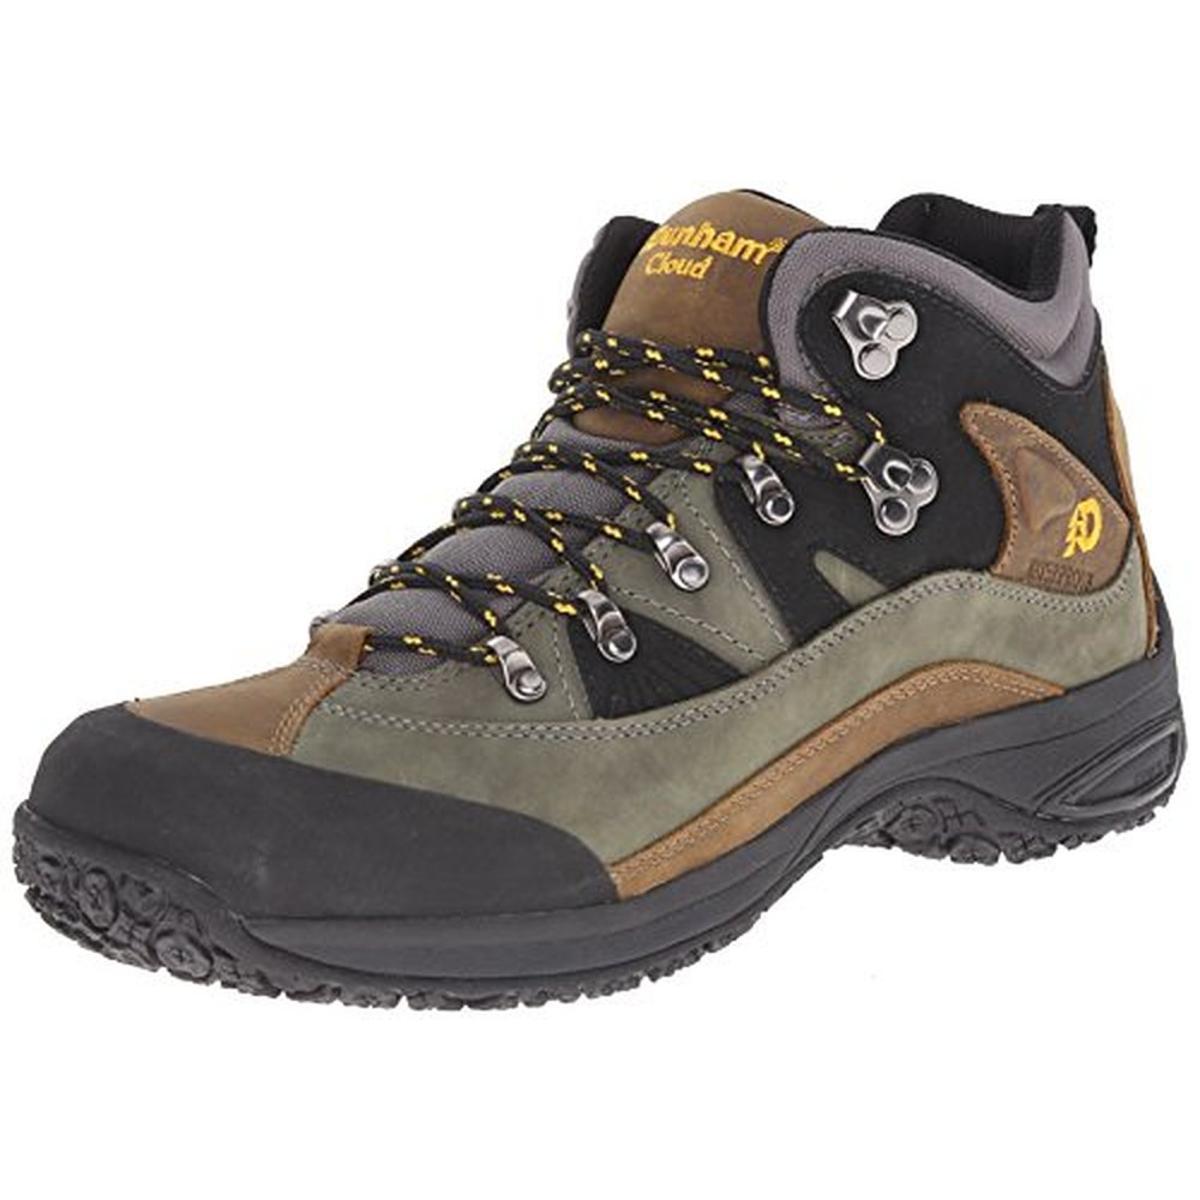 dunham by new balance 6429 mens cloud gray hiking boots 11